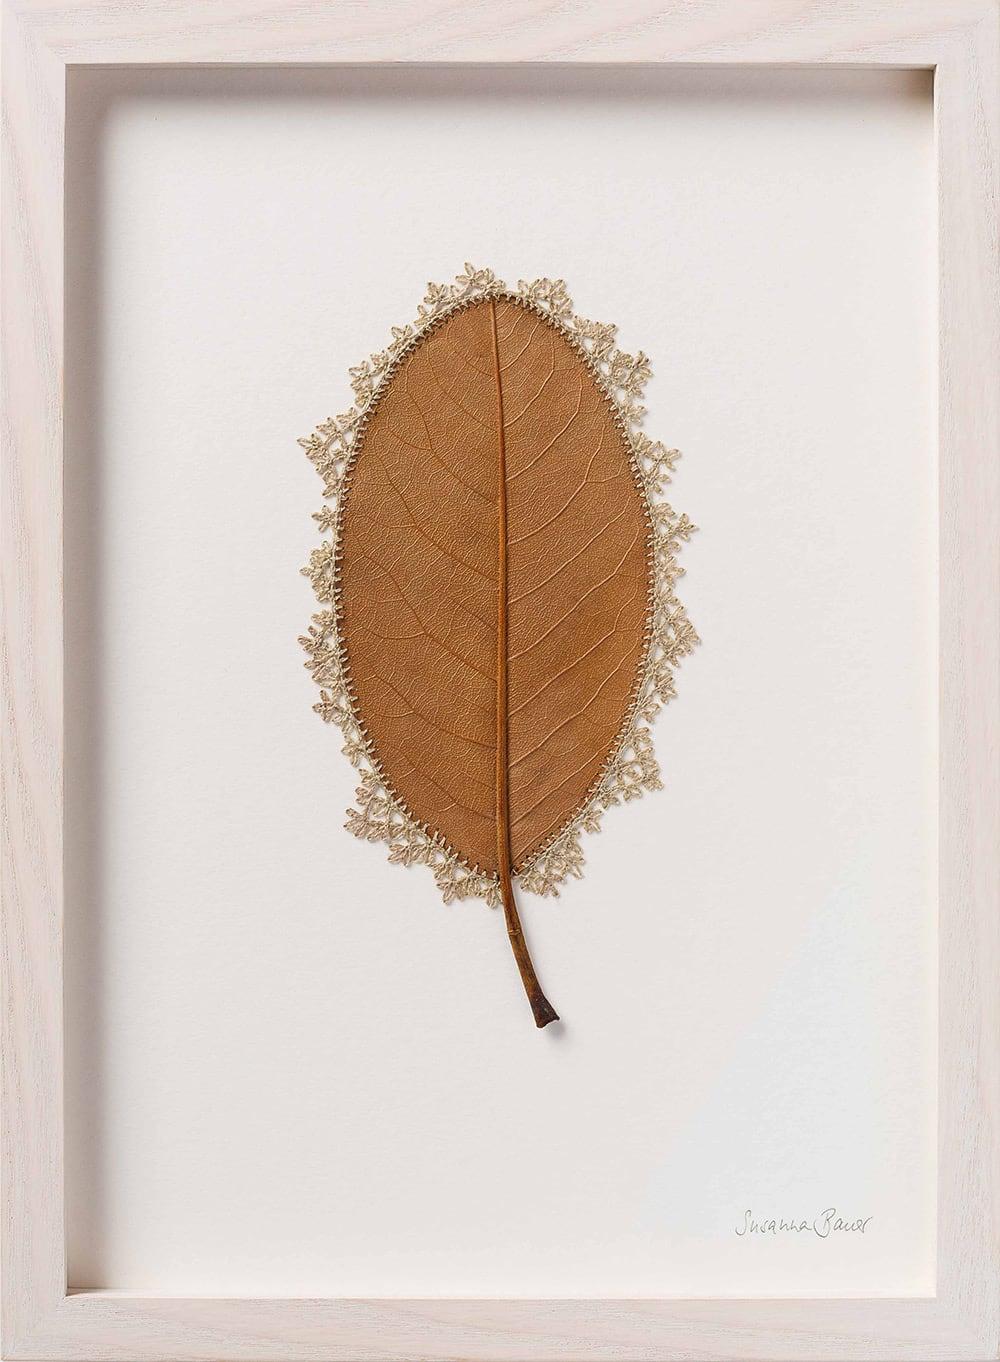 dried leaves usanna bauer 13